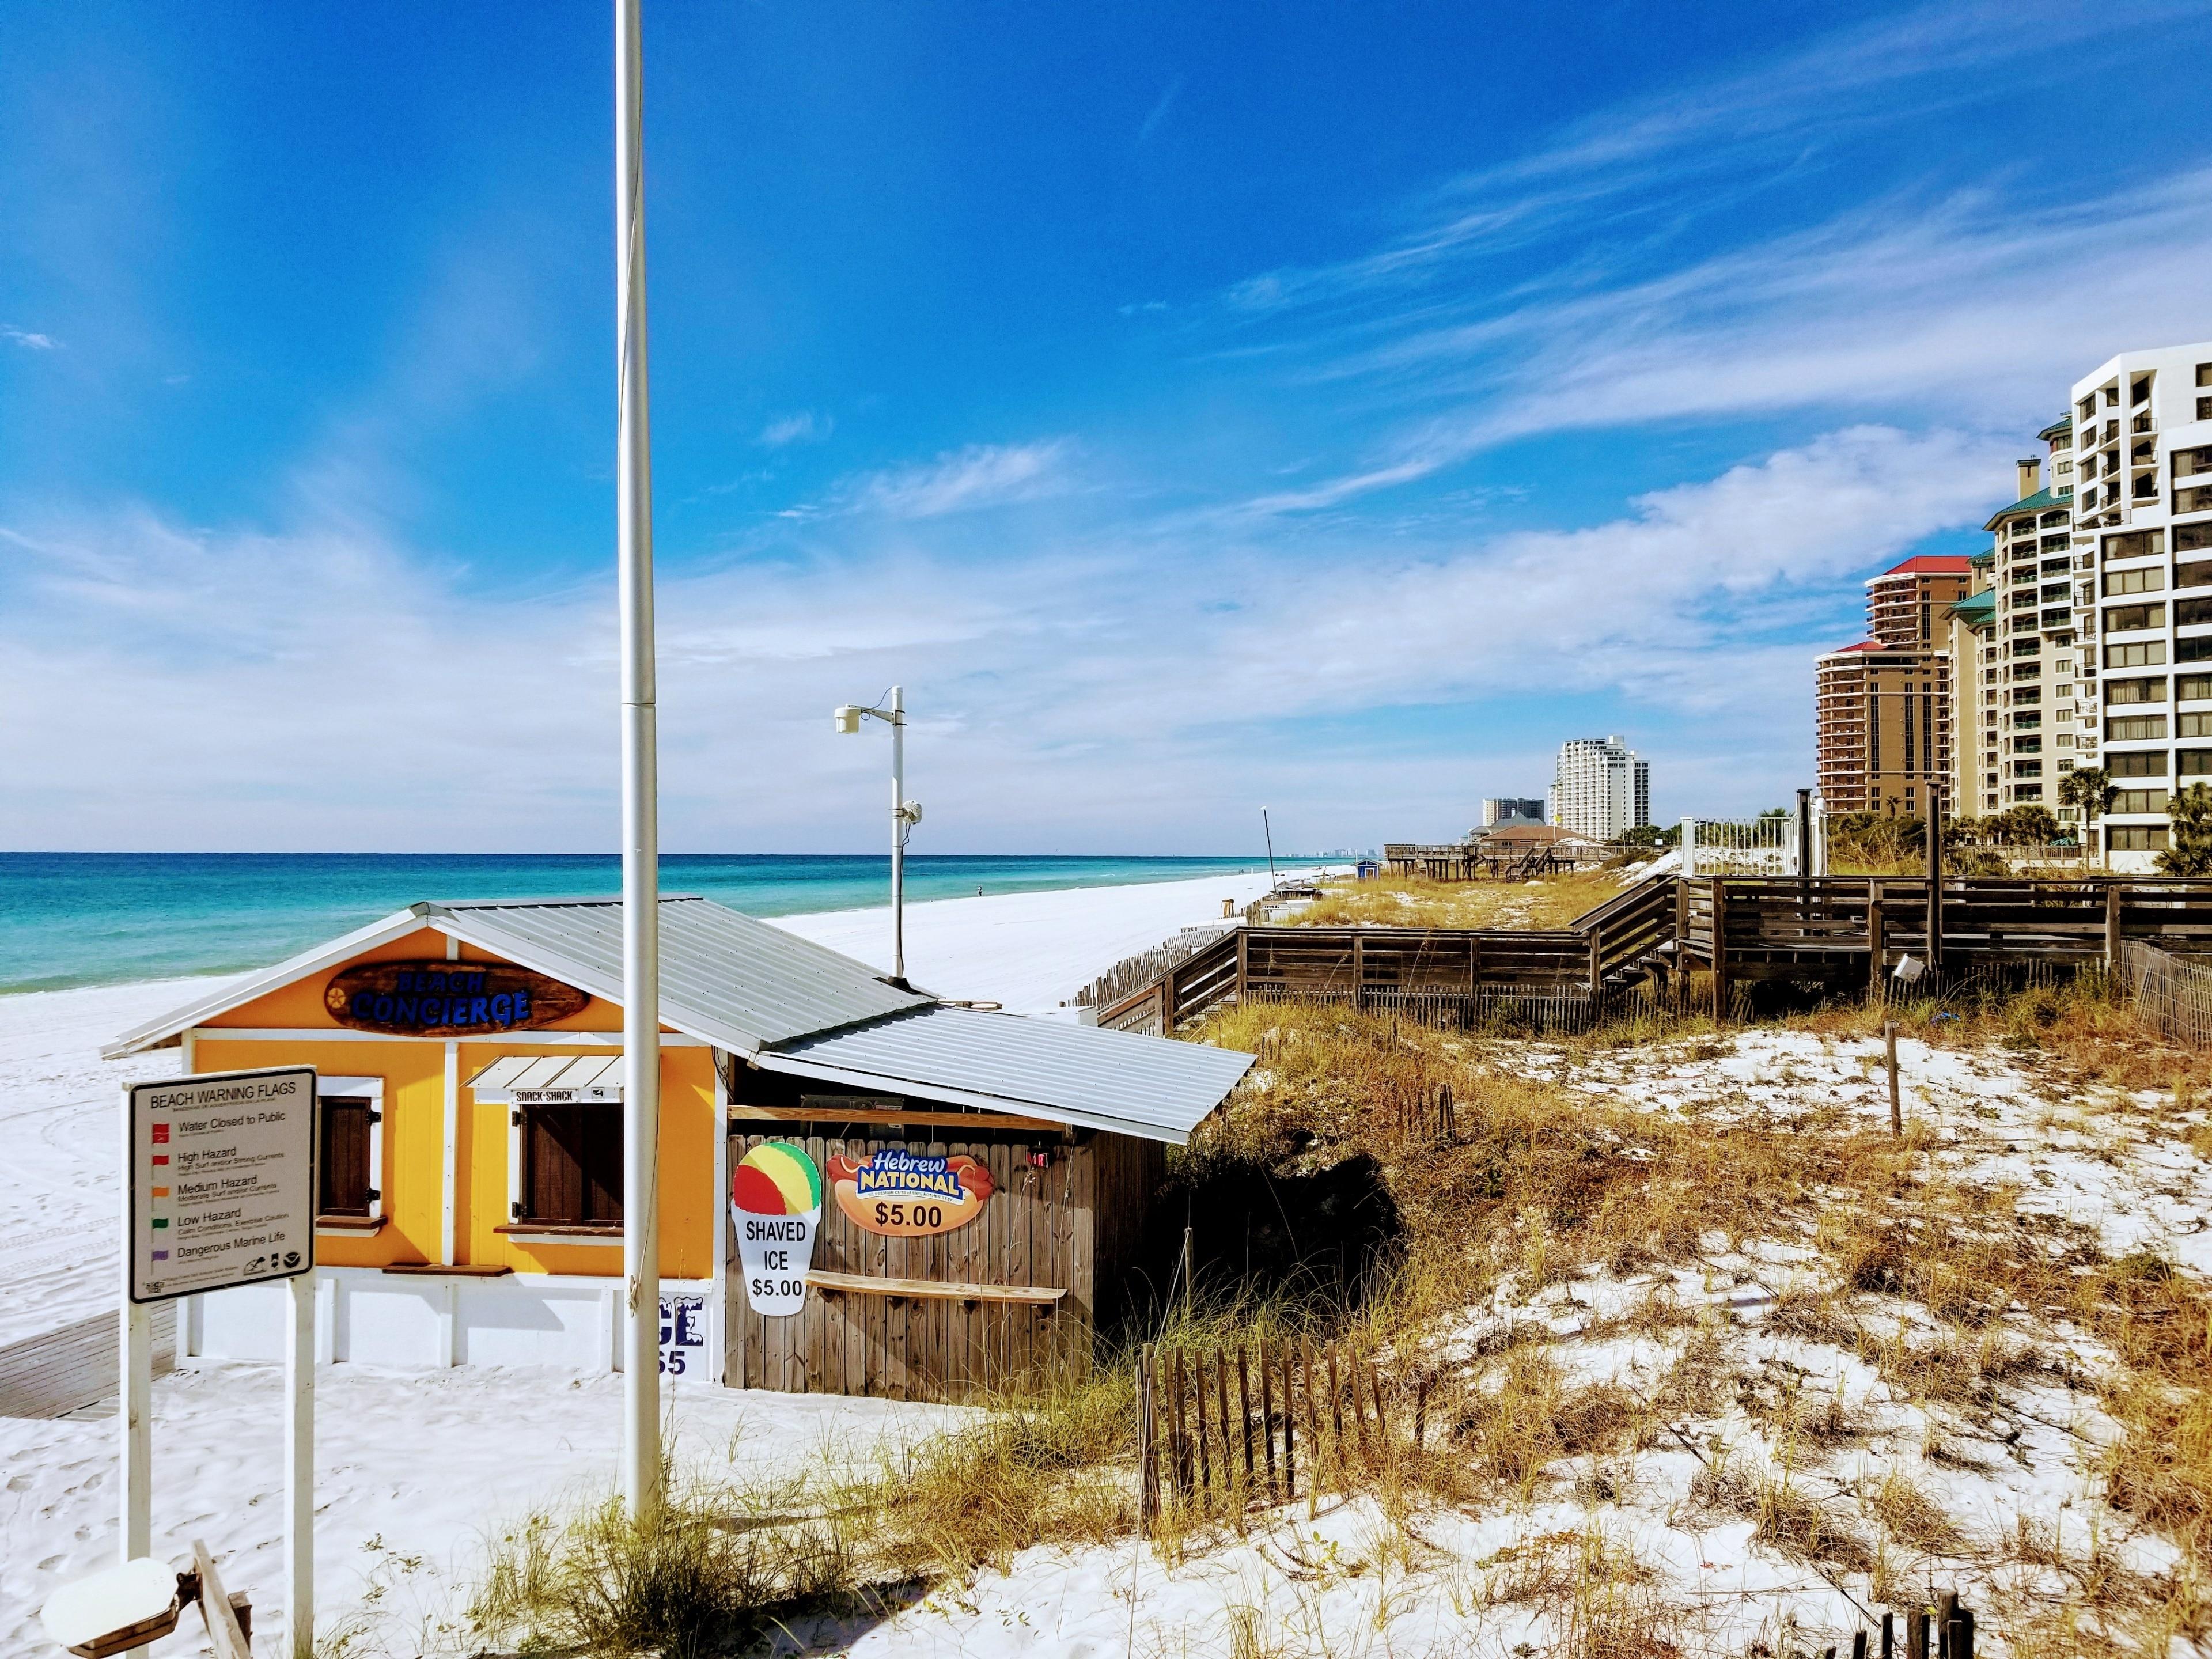 Miramar Beach, Florida, United States of America